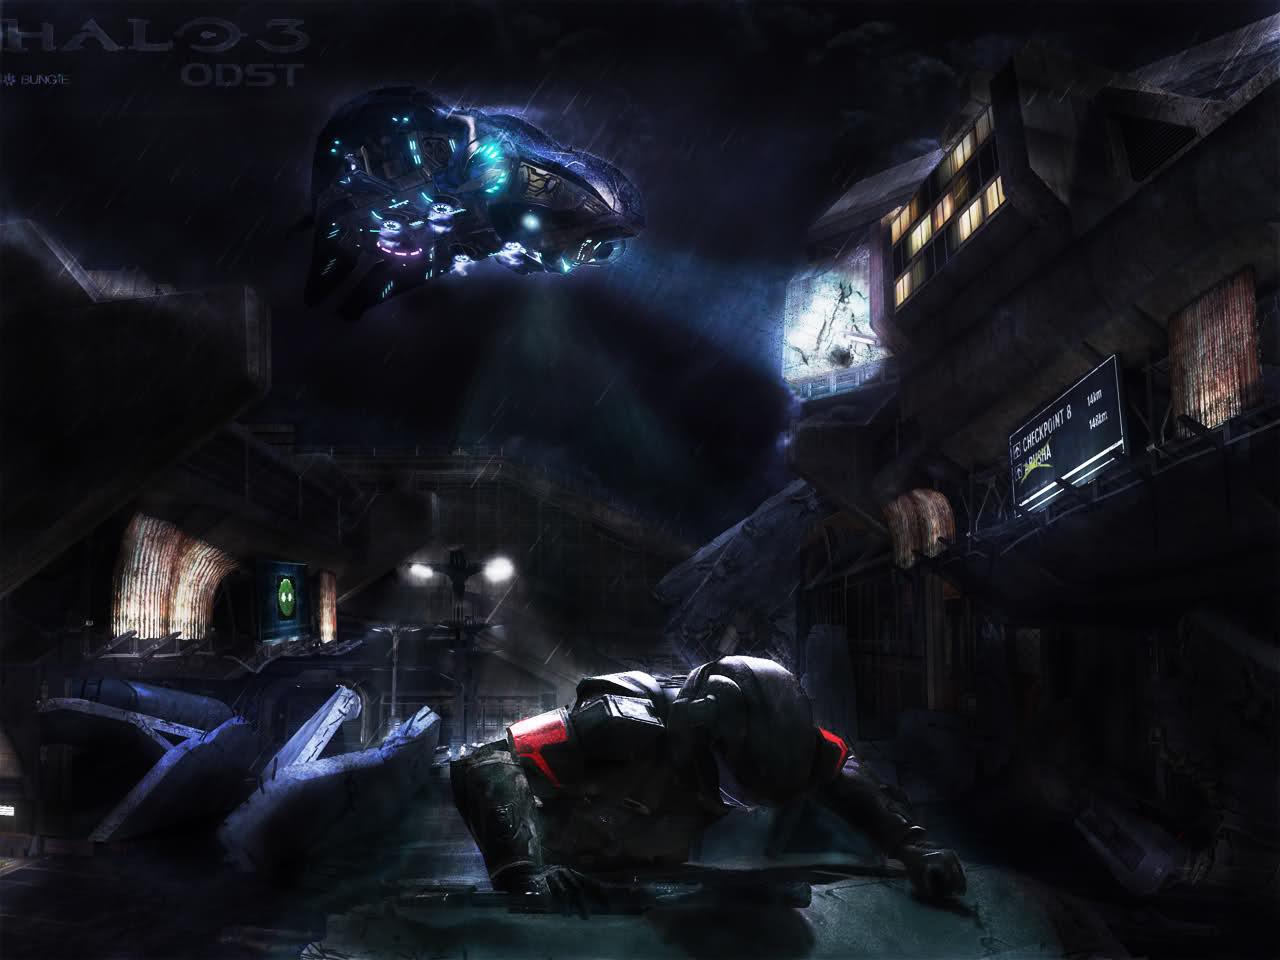 Bungie net : The Gallery : Halo 3: ODST [wallpaper]